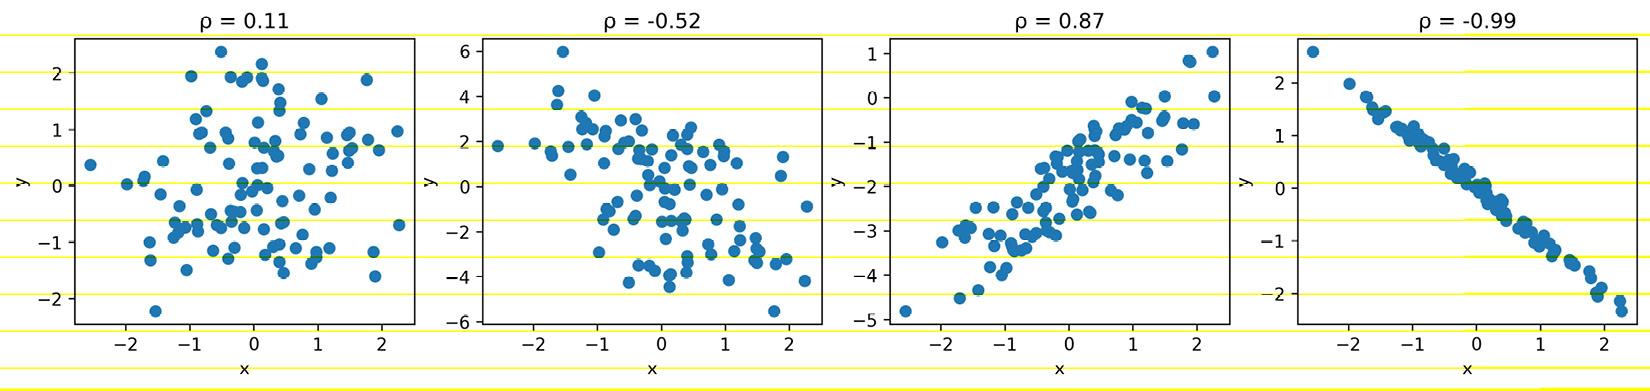 Figure 1.12 – Comparing correlation coefficients